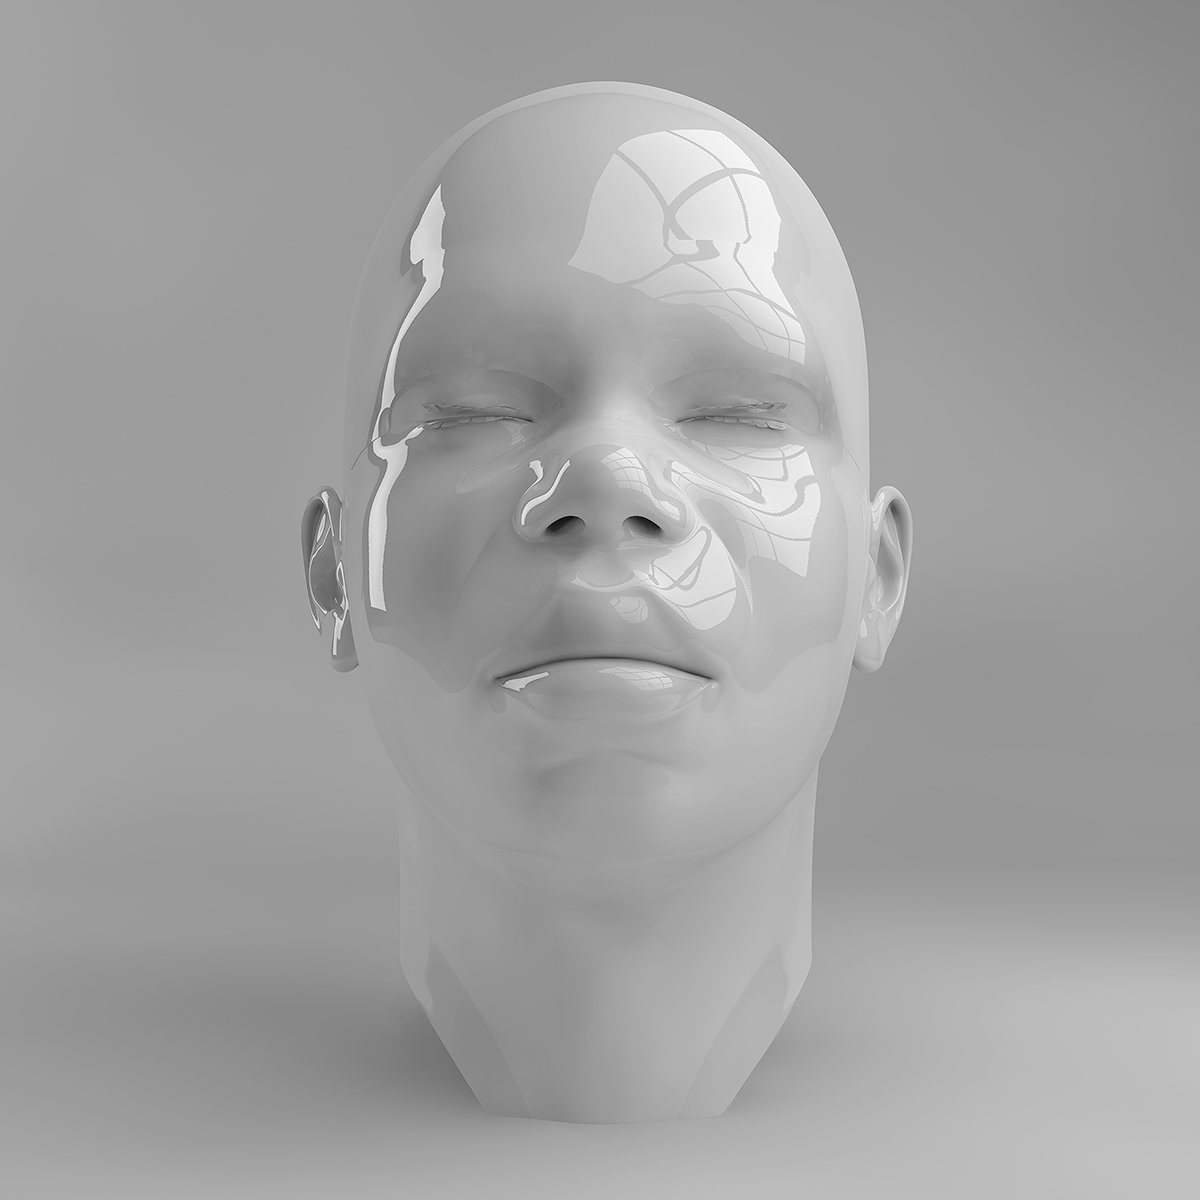 360 2011 eternal heads 002 resume high tty art - Resume - High Definition